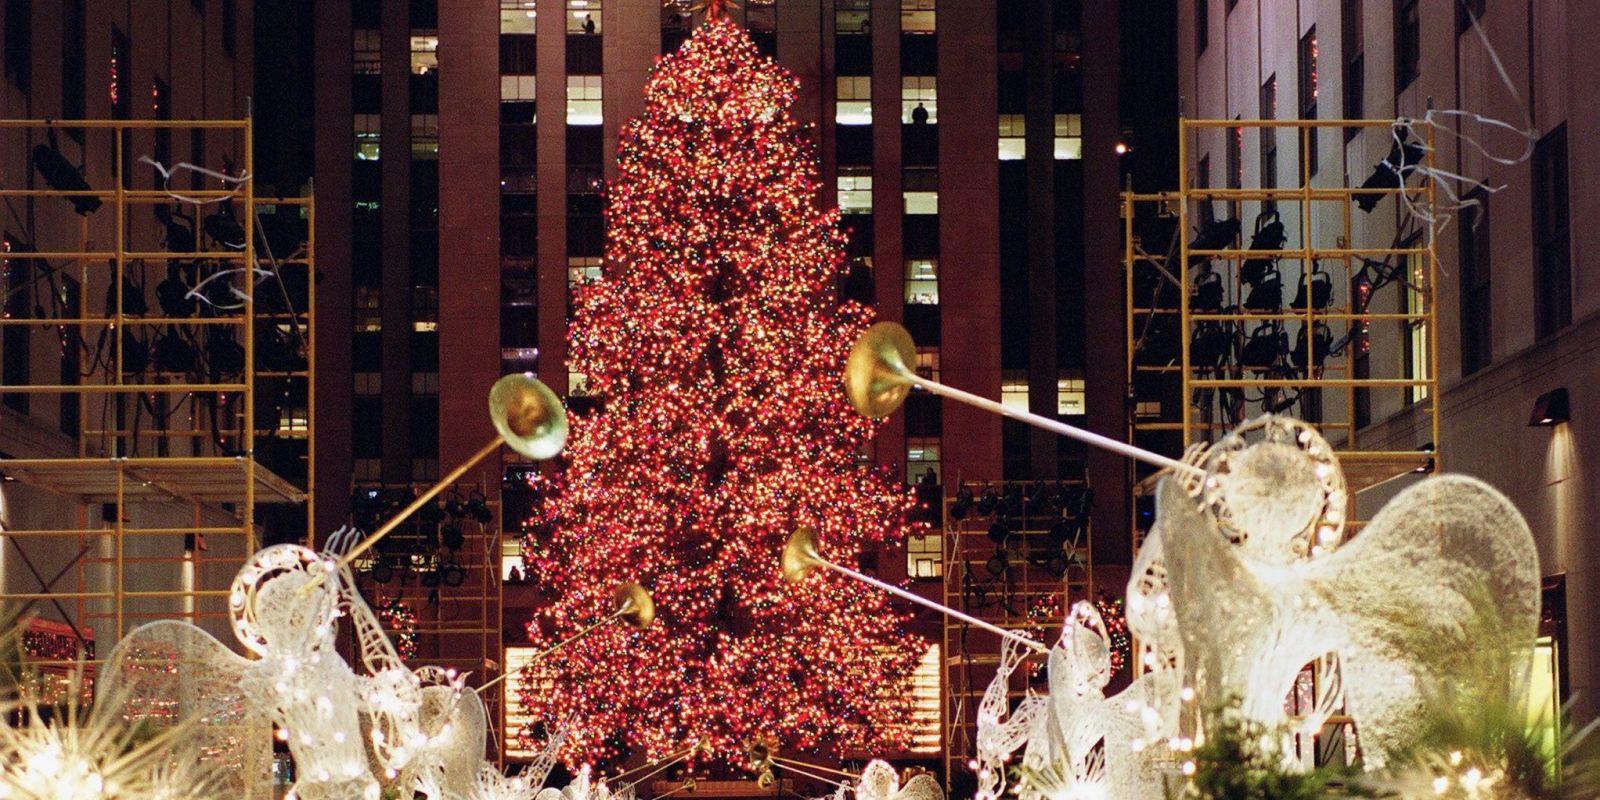 Rockefeller Center Christmas Tree Photos Through The Years